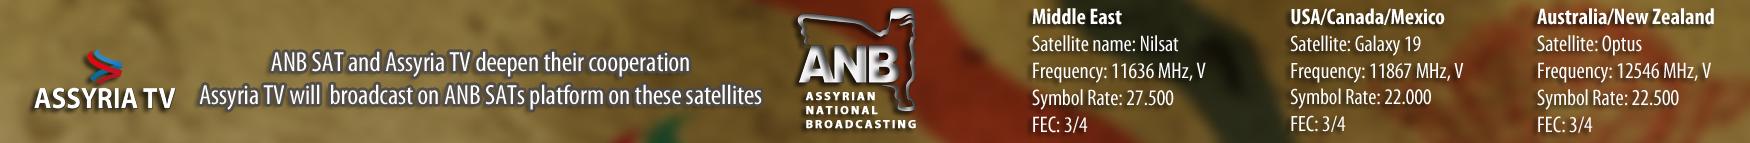 Assyria TV & ANB SAT